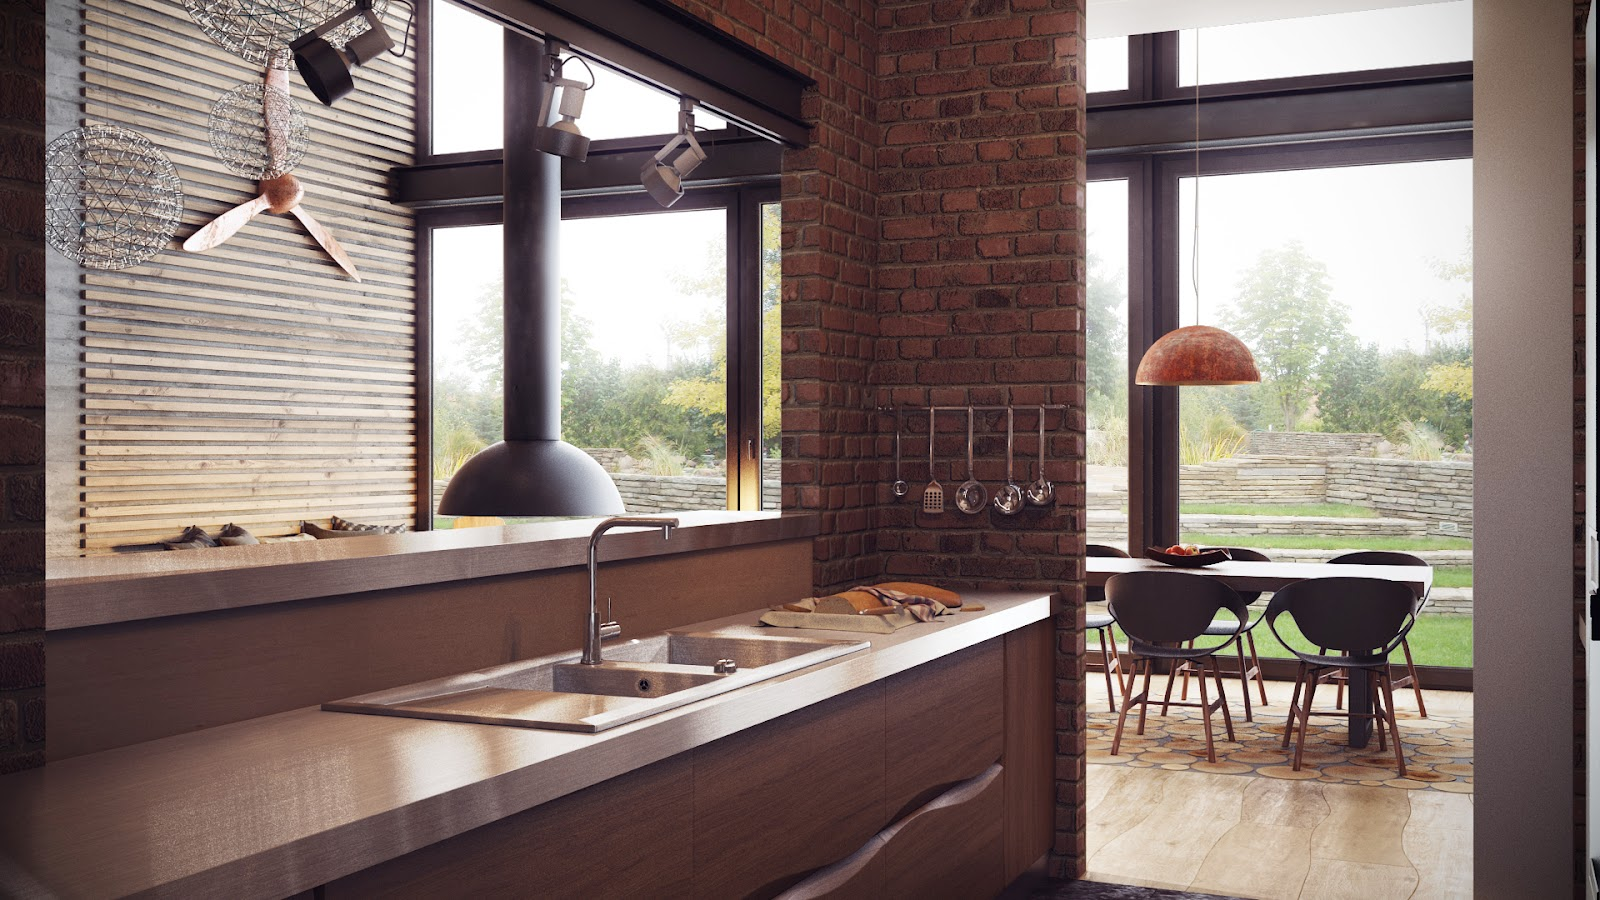 1-Sleek-kitchen-design.jpeg